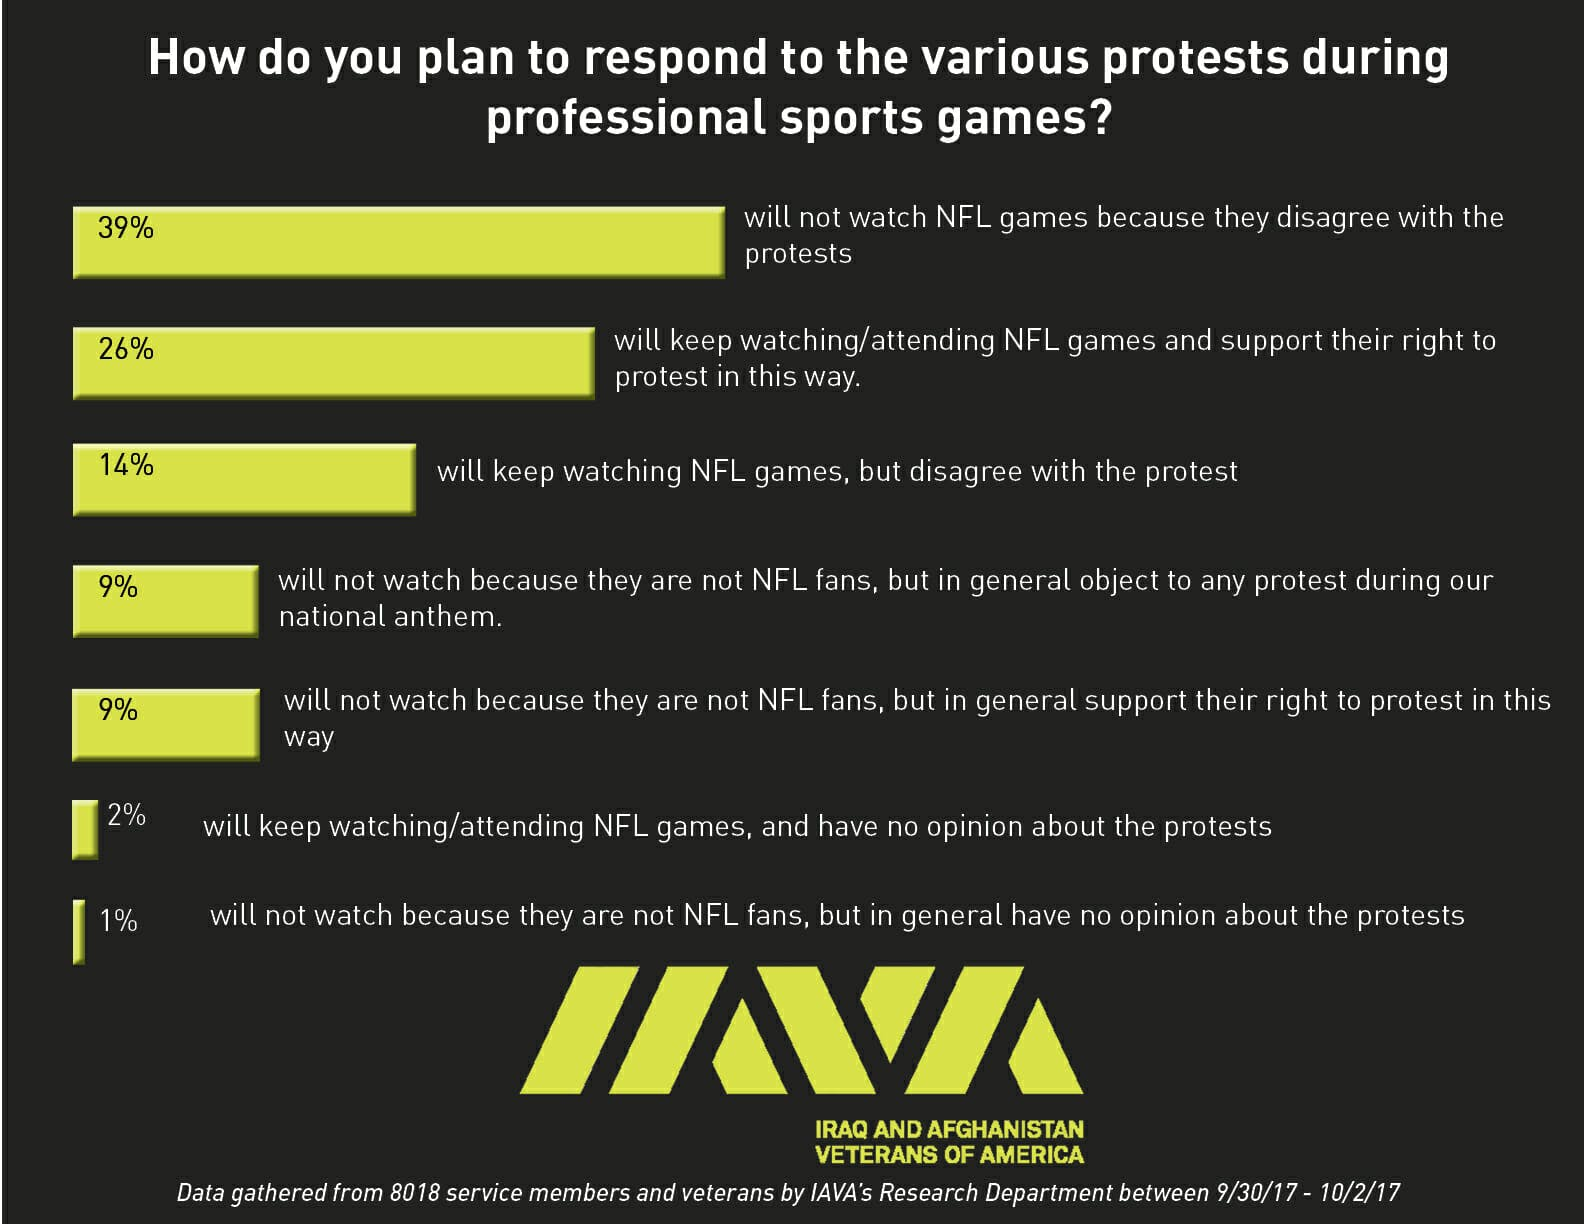 IAVA NFL poll